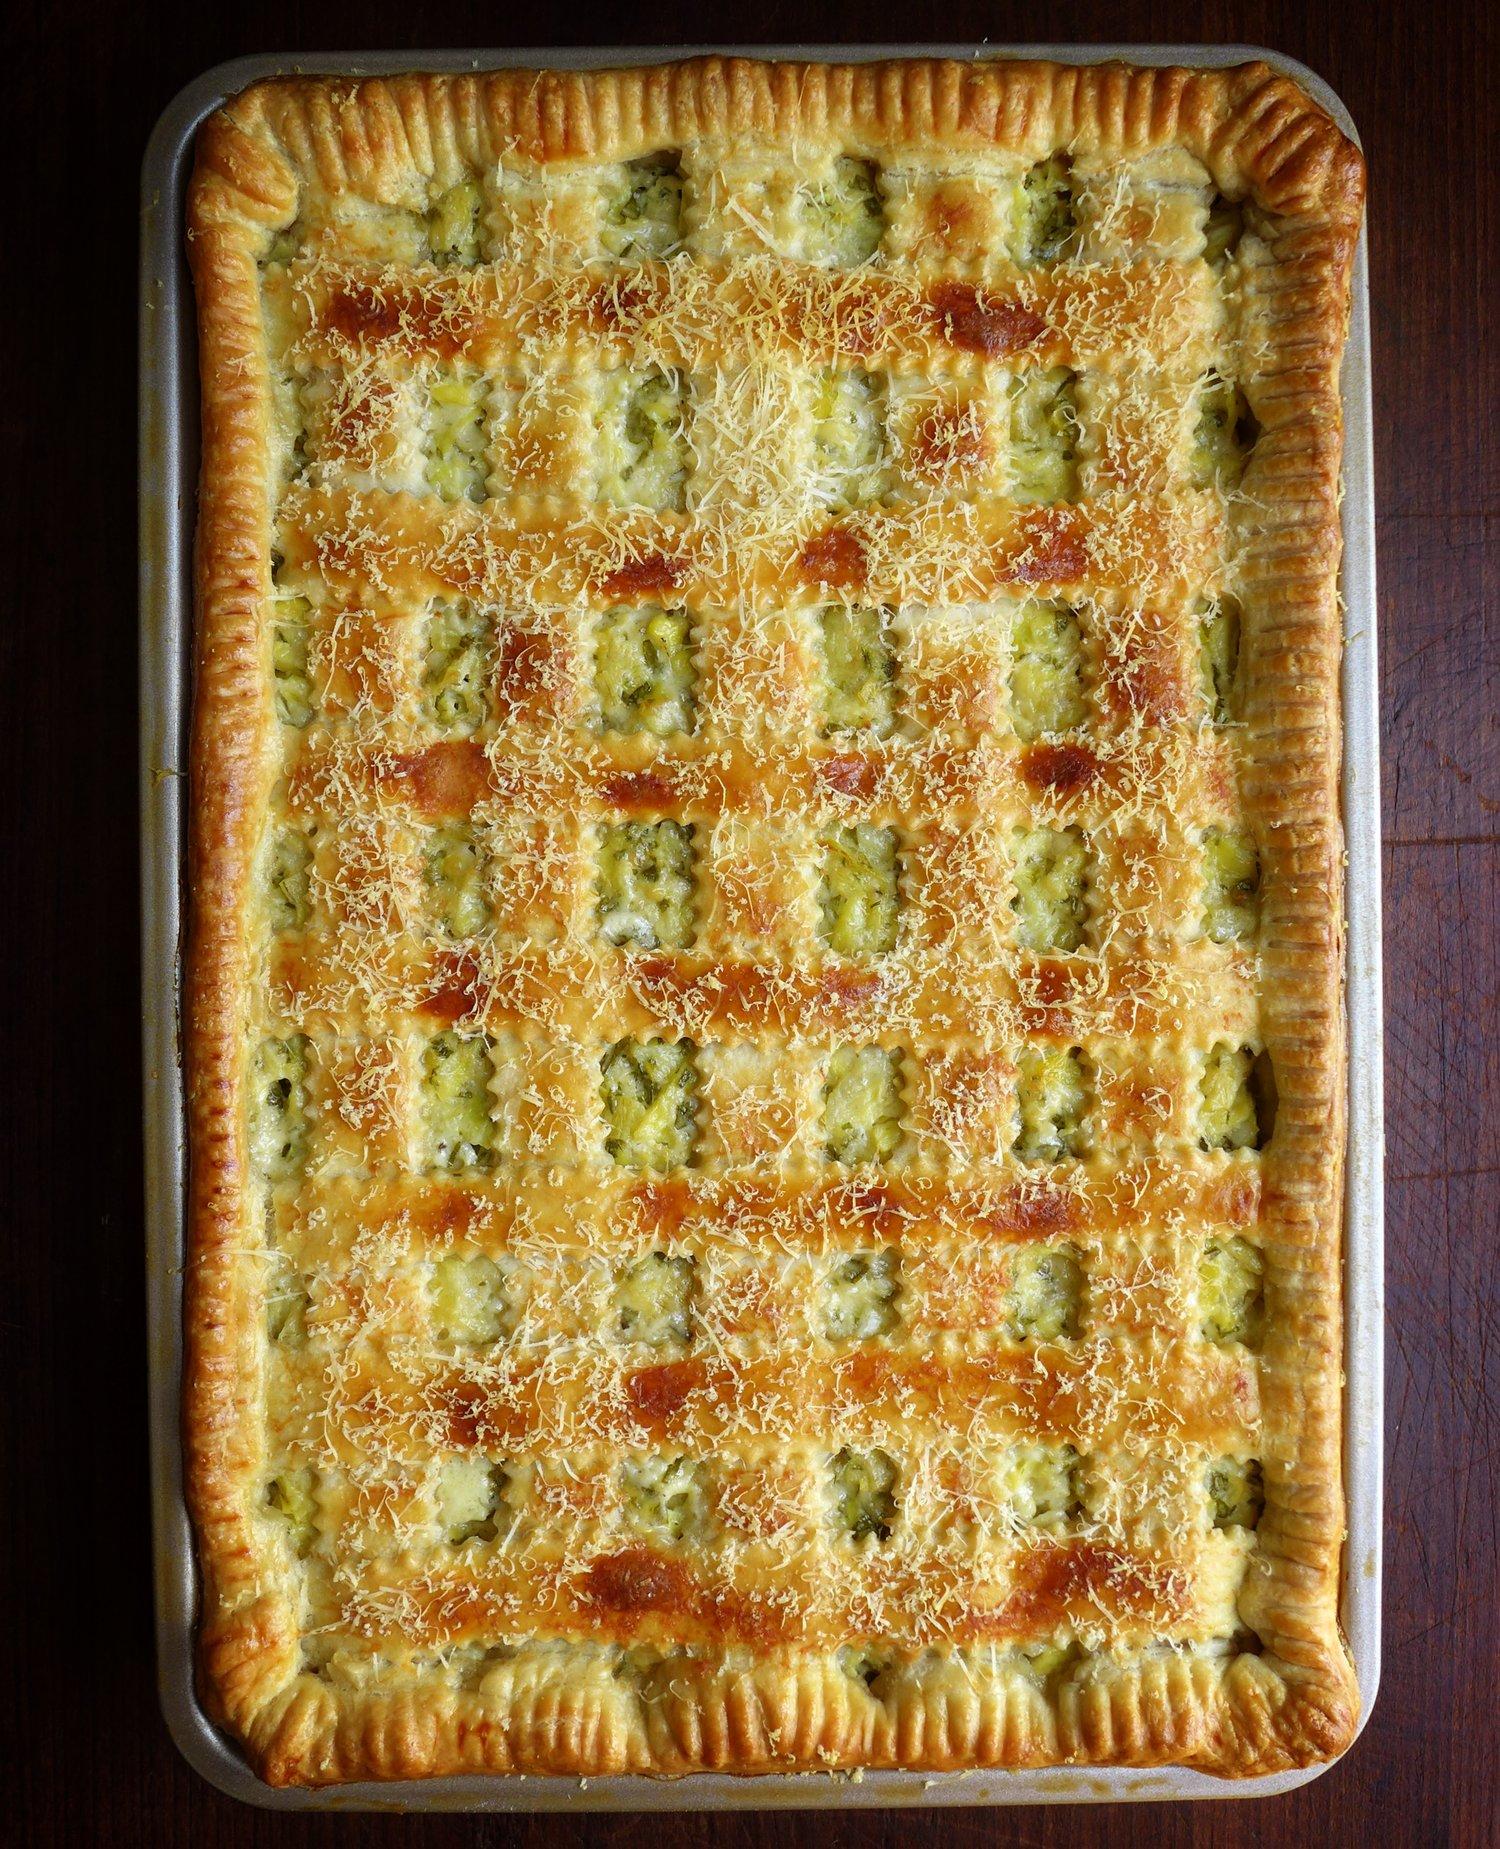 Just-Like-Artichoke-Dip Slab Pie with a Cream Cheese Crust